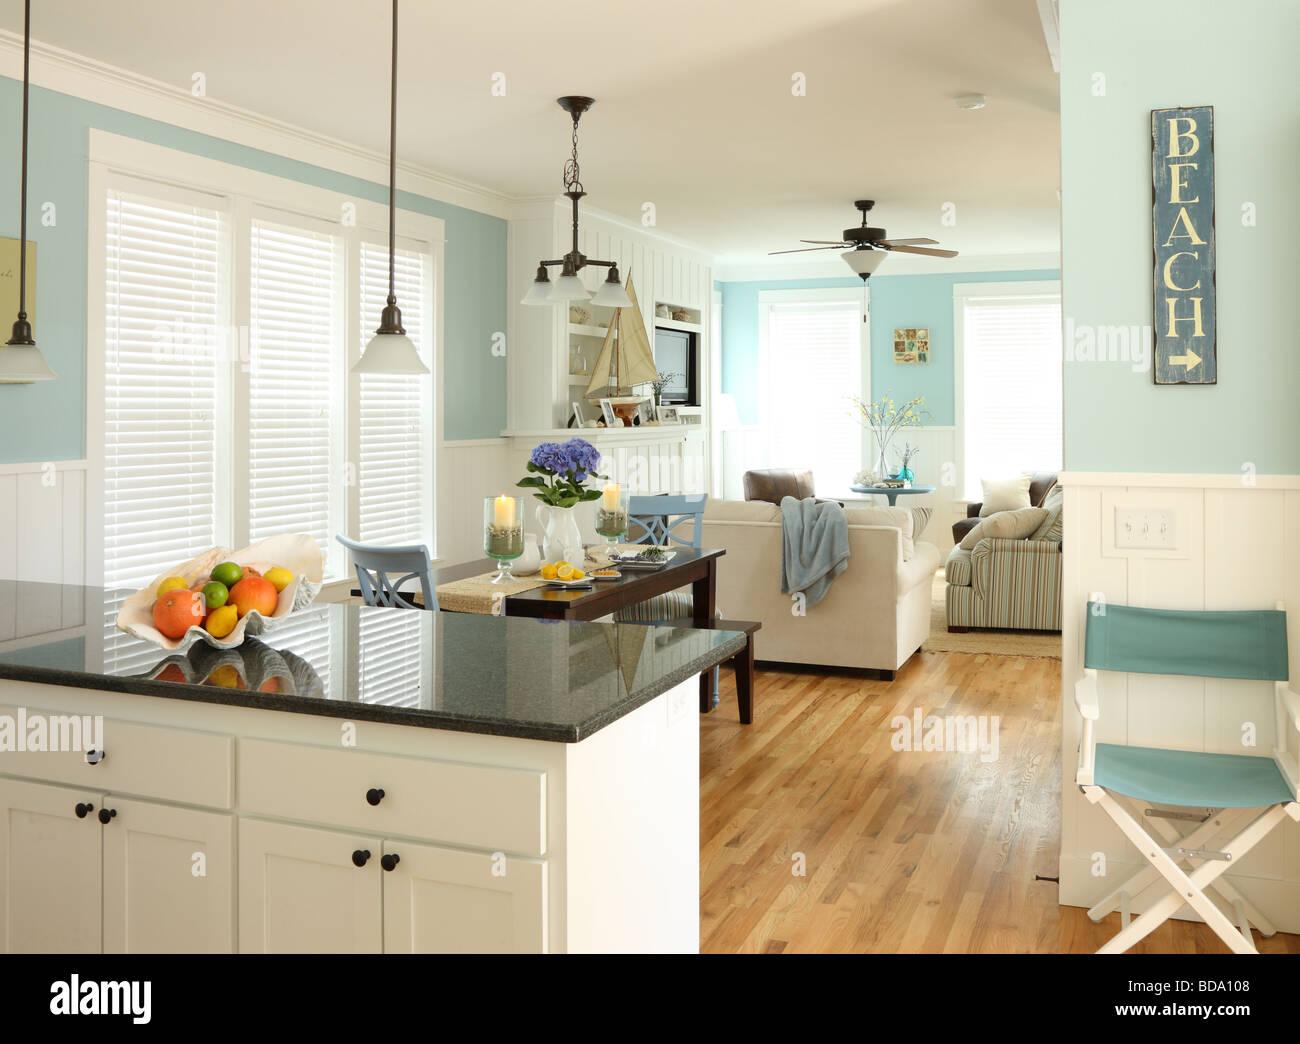 Beach house interior Photo Stock